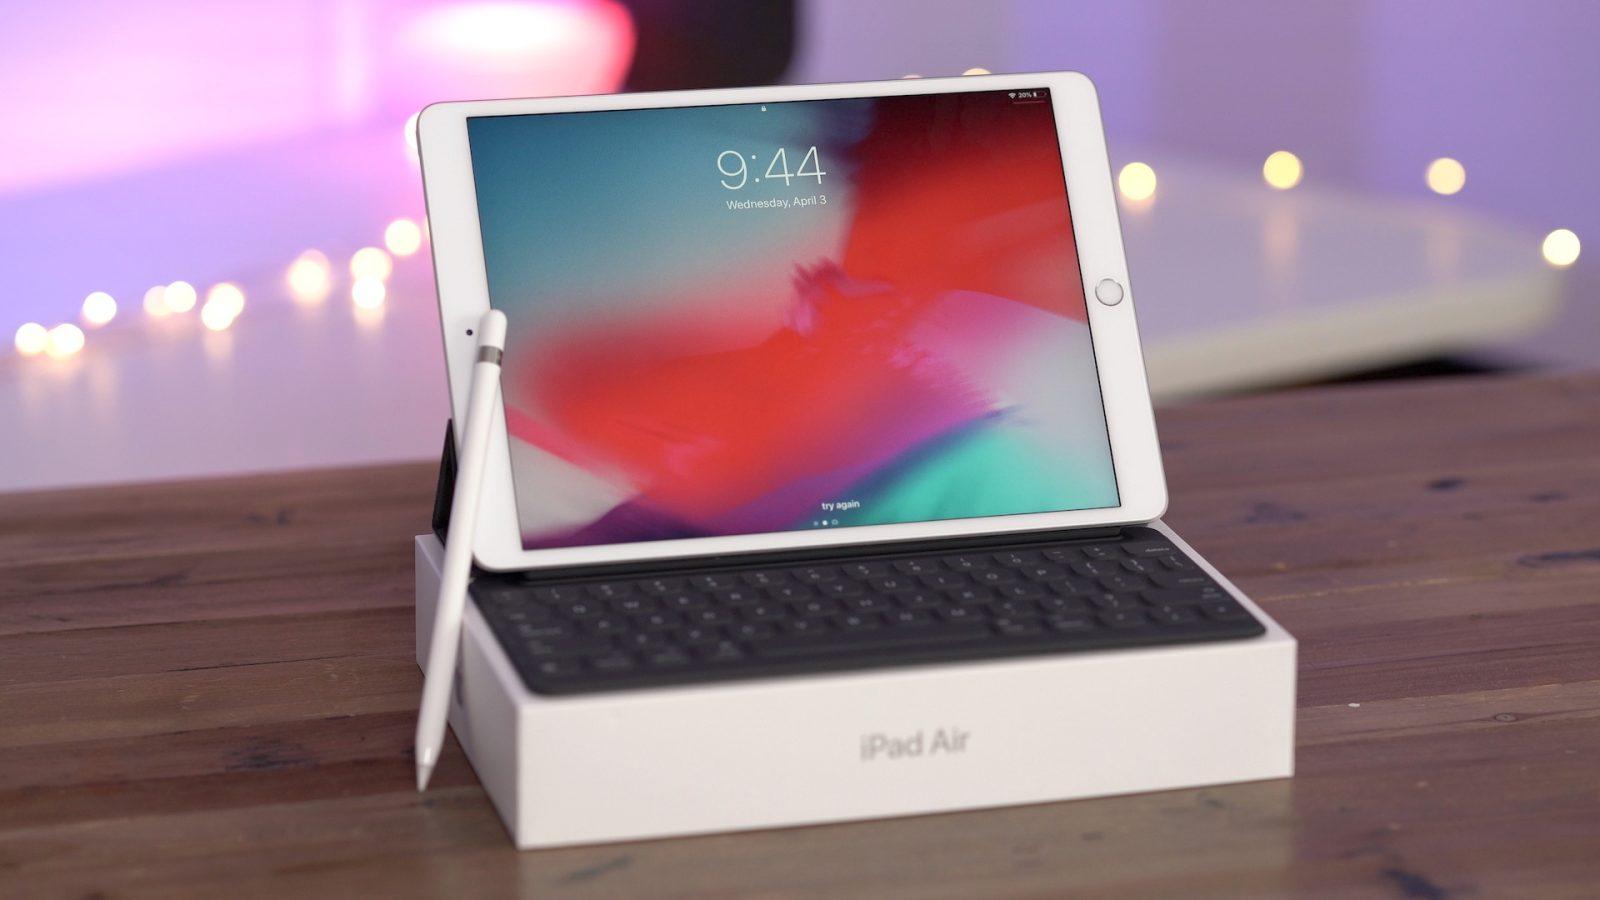 iPad Air 3 review: Semi-Pro [Video] - 9to5Mac